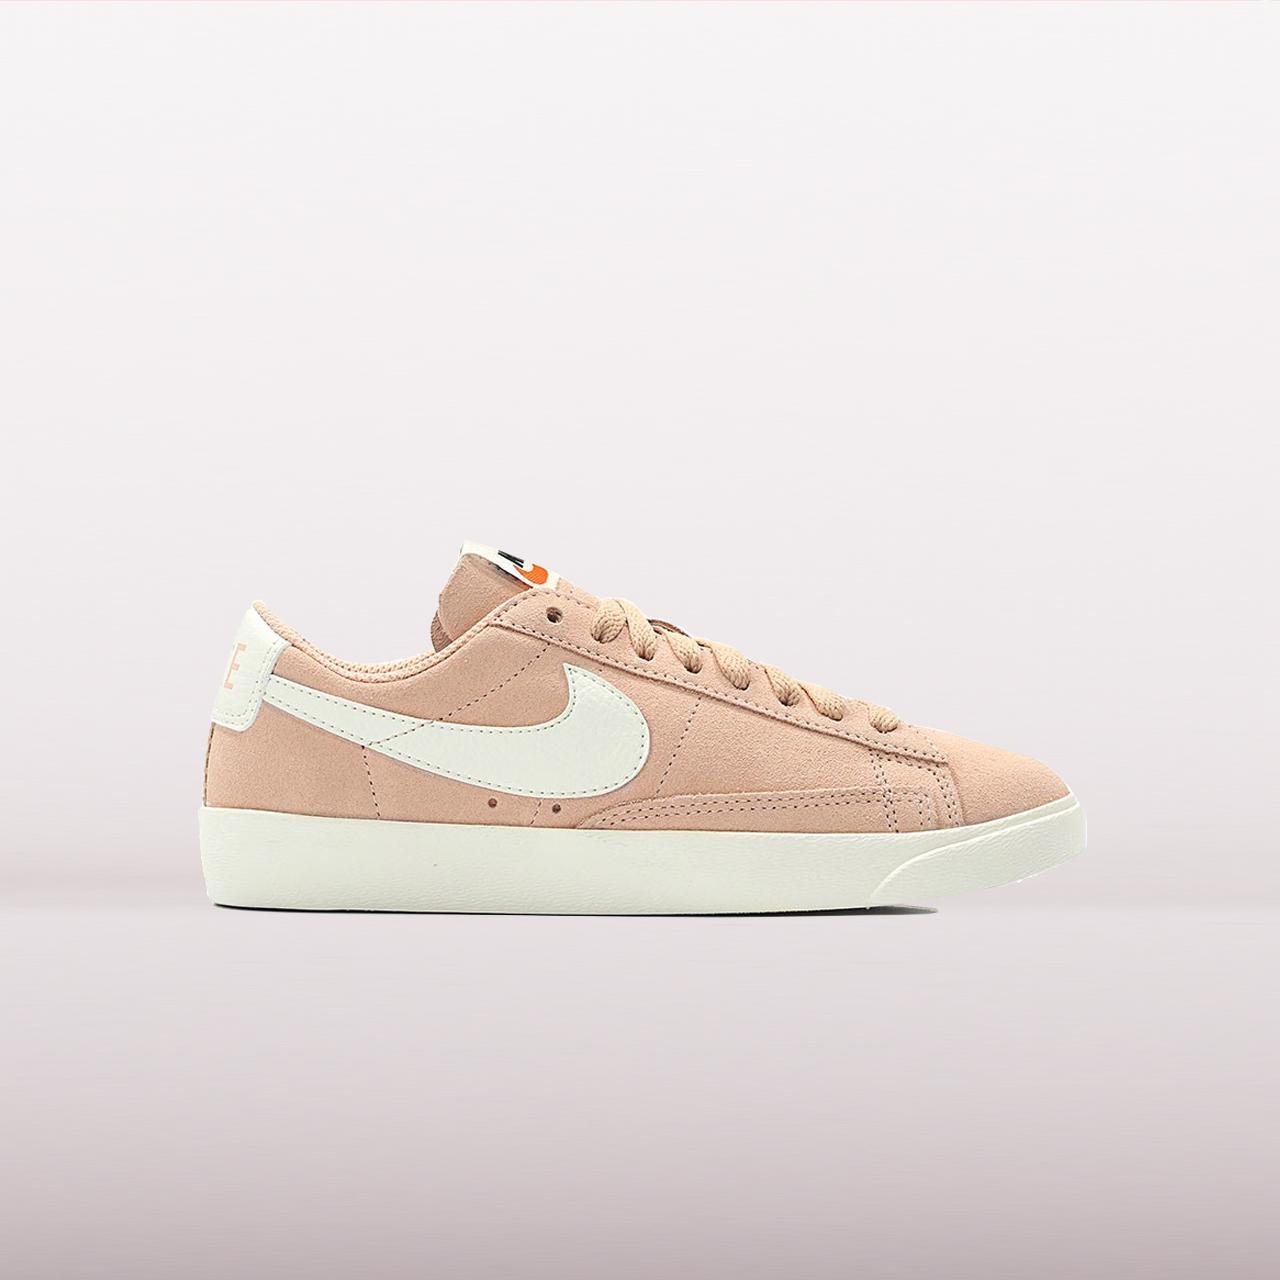 5af033b0f85 NIKE Blazer Low SD Sneakers Dames – Collab Sneakers